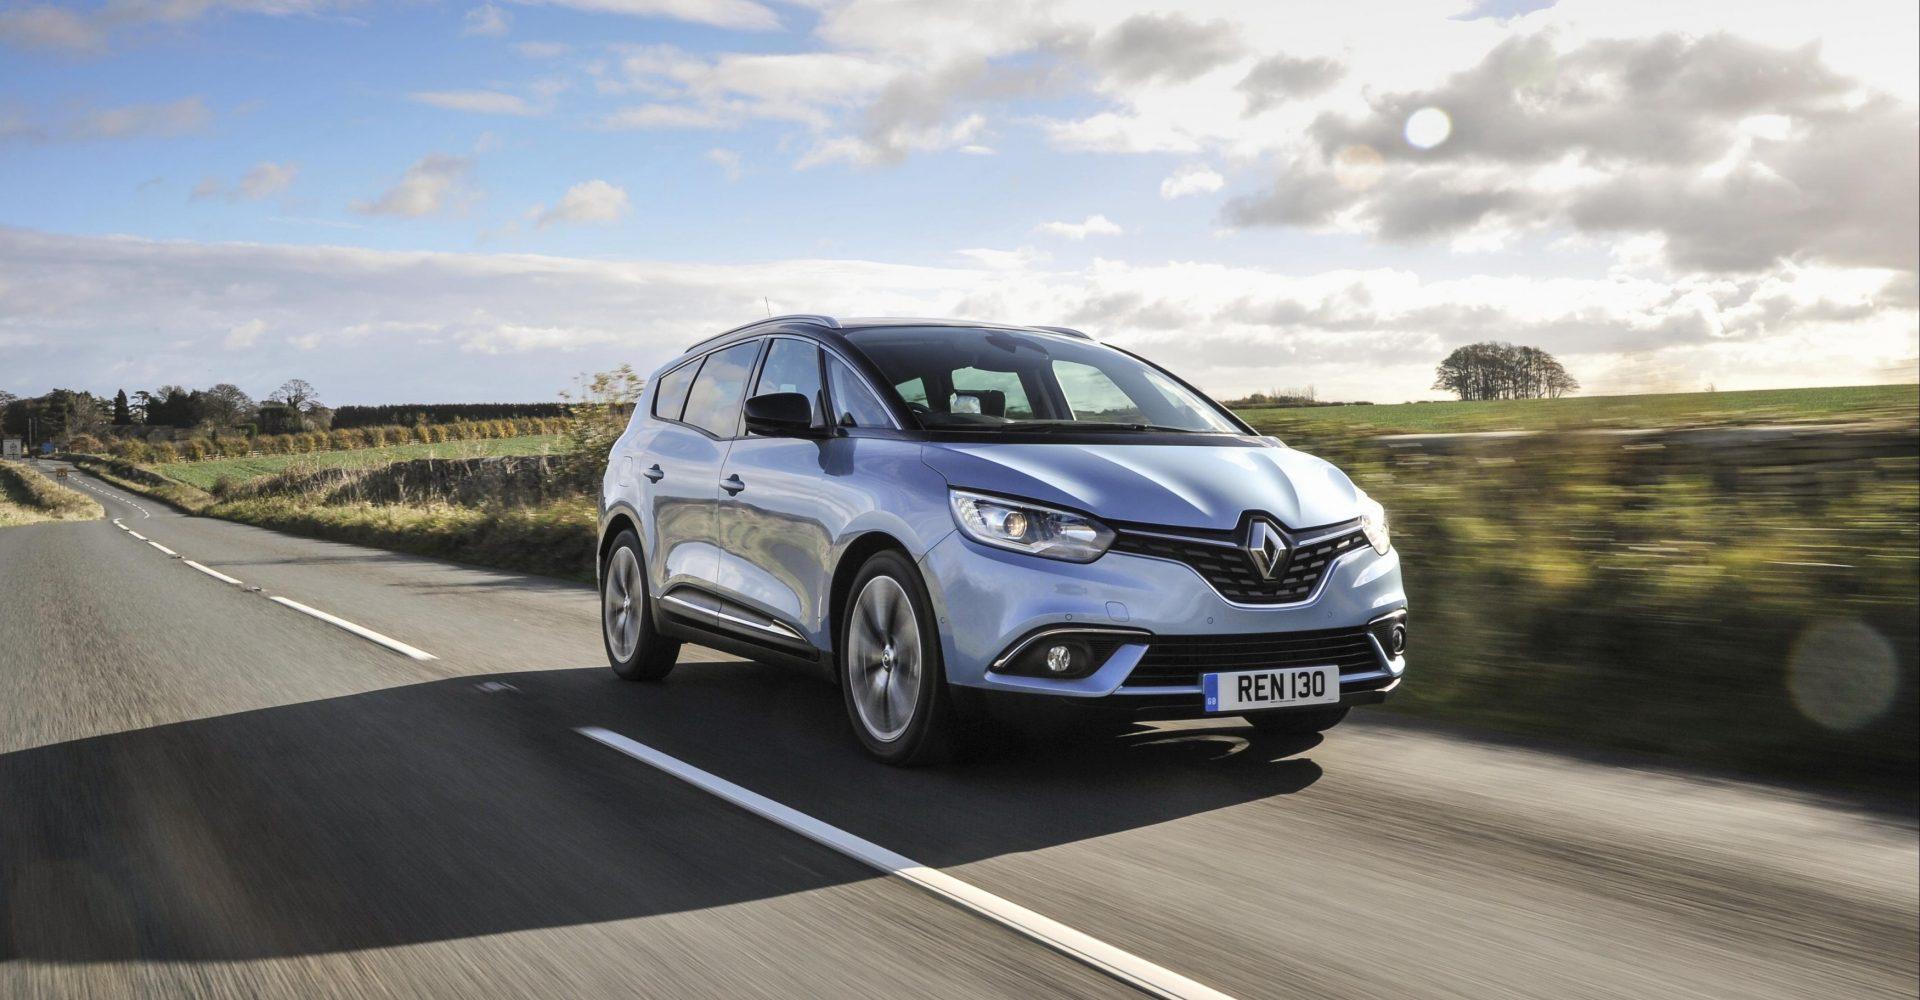 Renault drops Grand Scenic from UK range